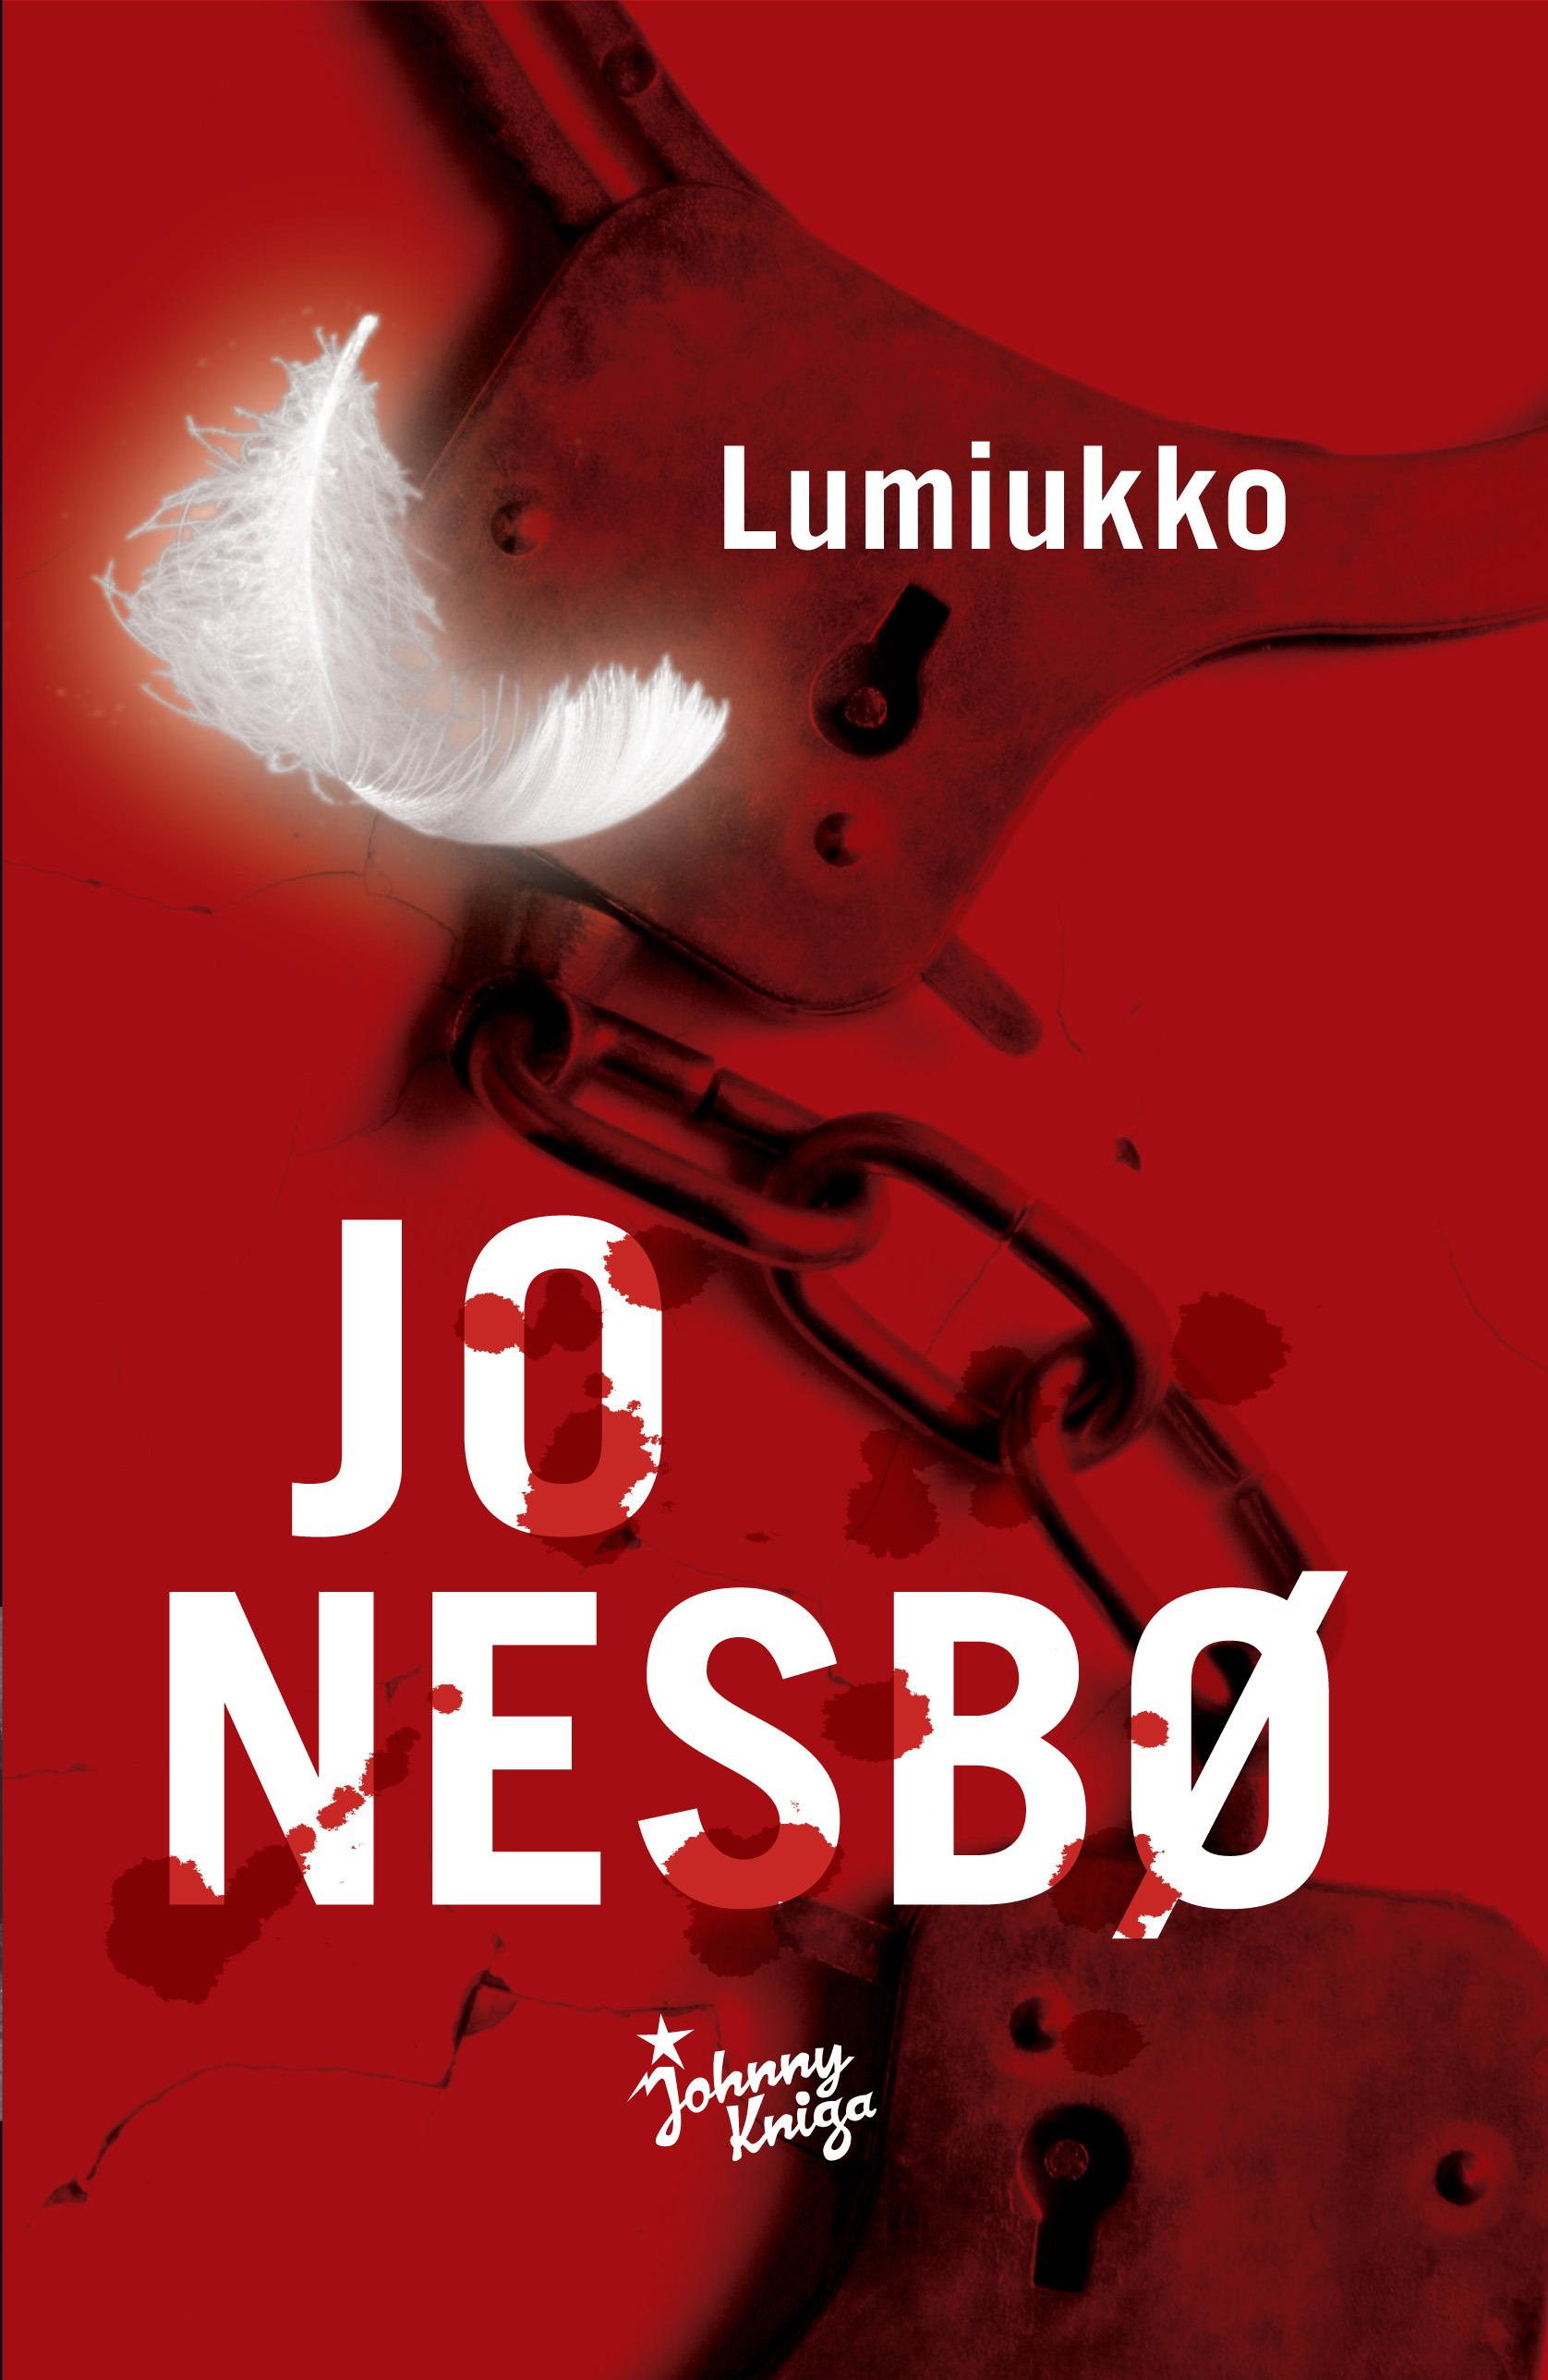 Nesbø, Jo - Lumiukko, e-bok